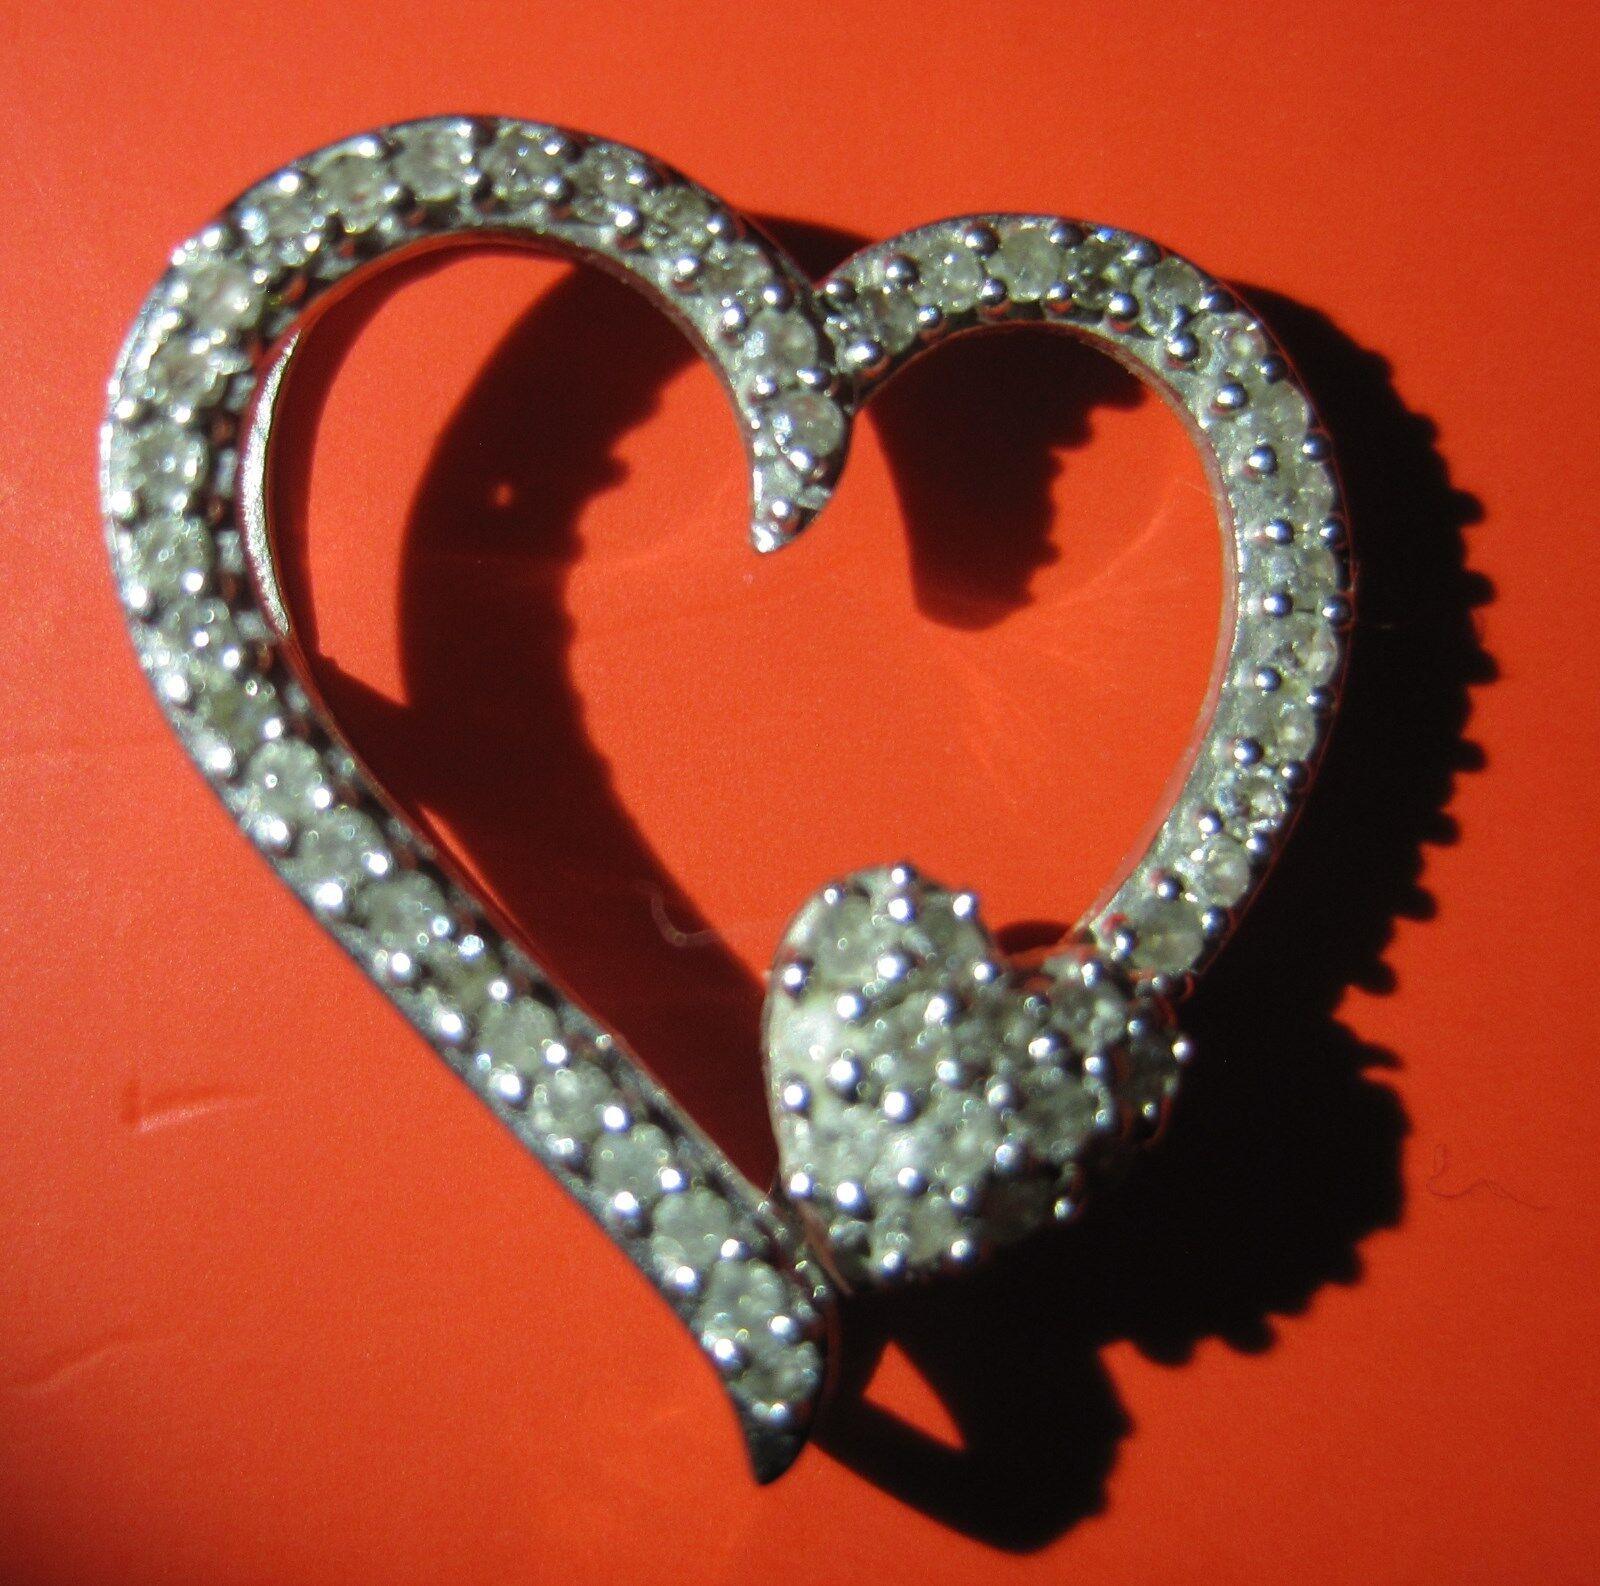 10 Karat Solid White gold 1 5 ctw Diamond Double Heart Pendant 17mmx19mm NEW USA